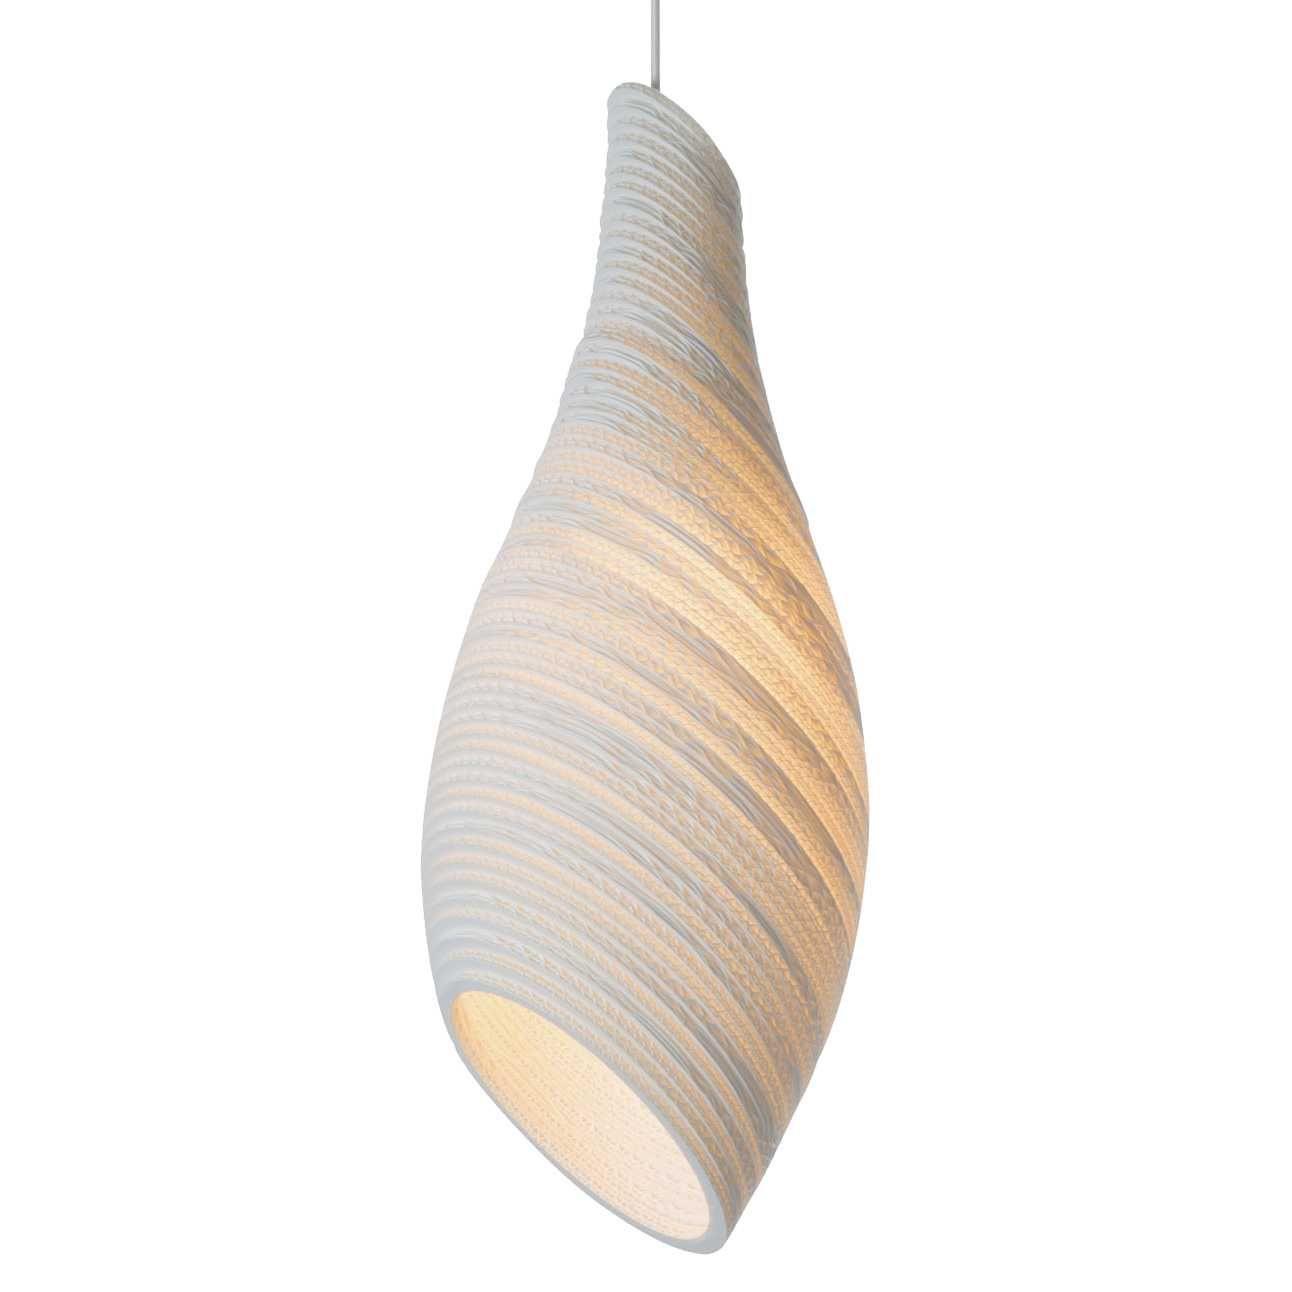 FonQ-Graypants Nest 32 hanglamp wit-aanbieding